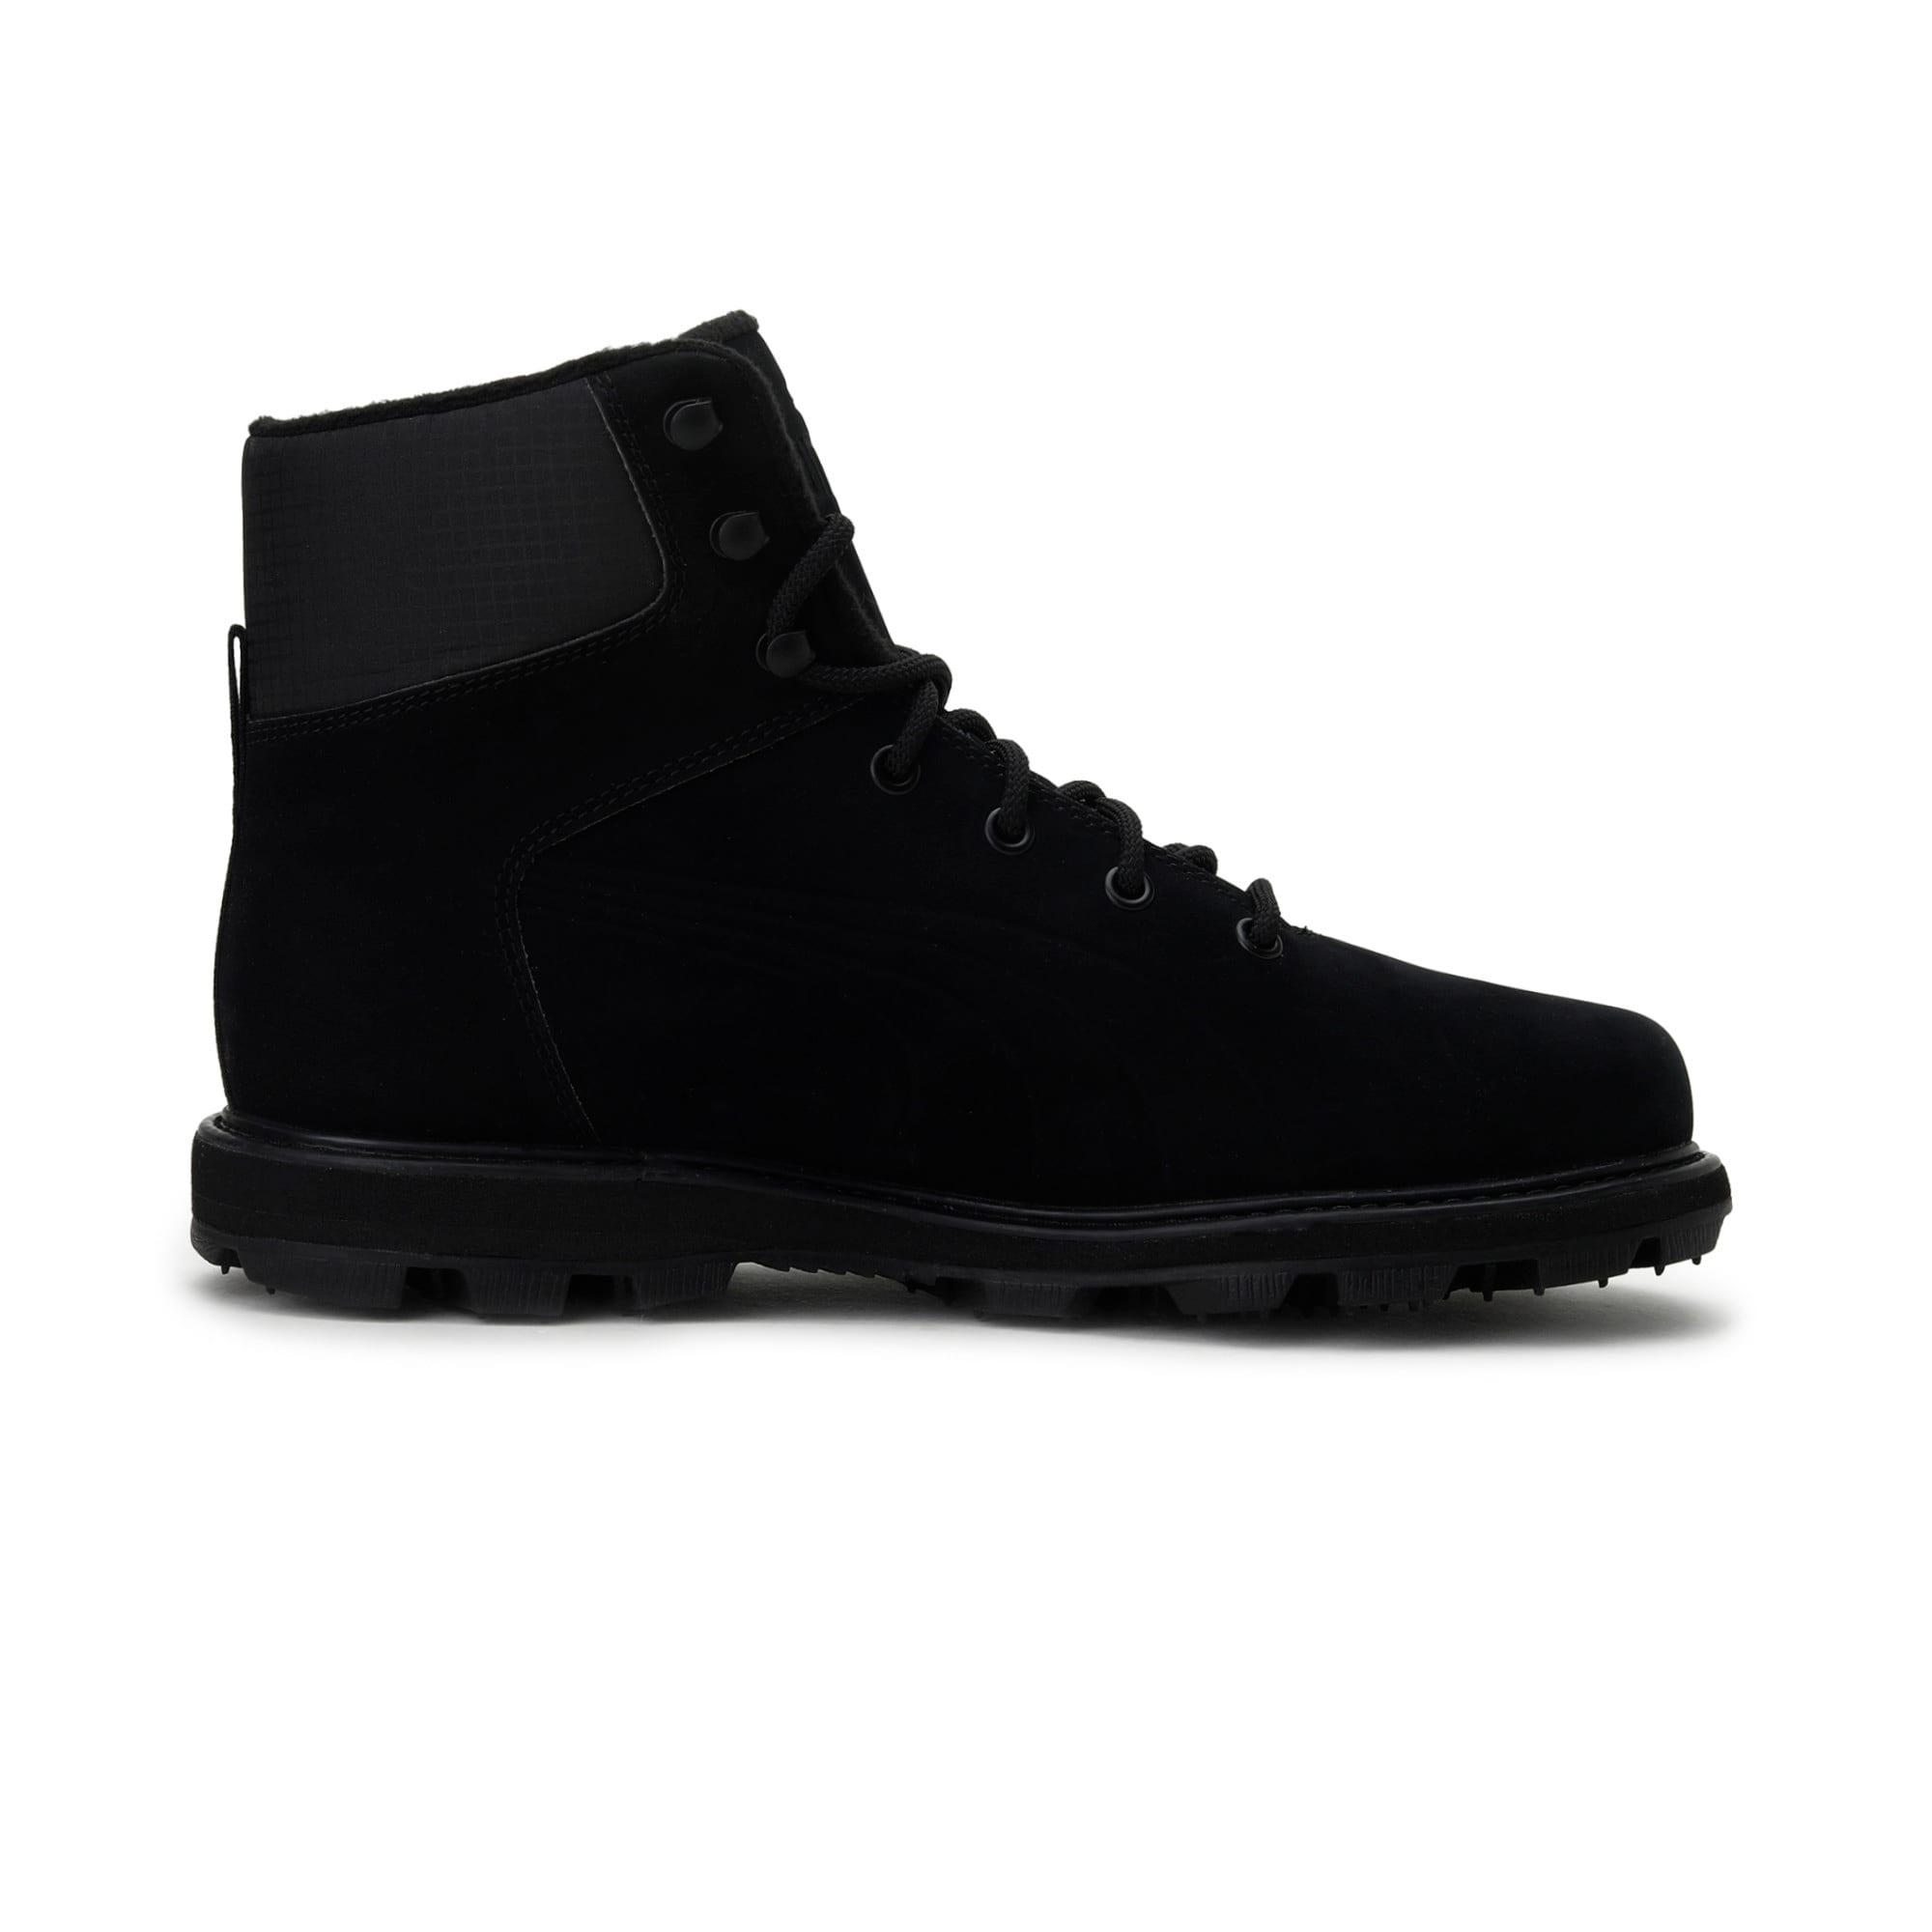 Thumbnail 5 of Desierto Fun Winter Boots, Puma Black- Black- Black, medium-IND